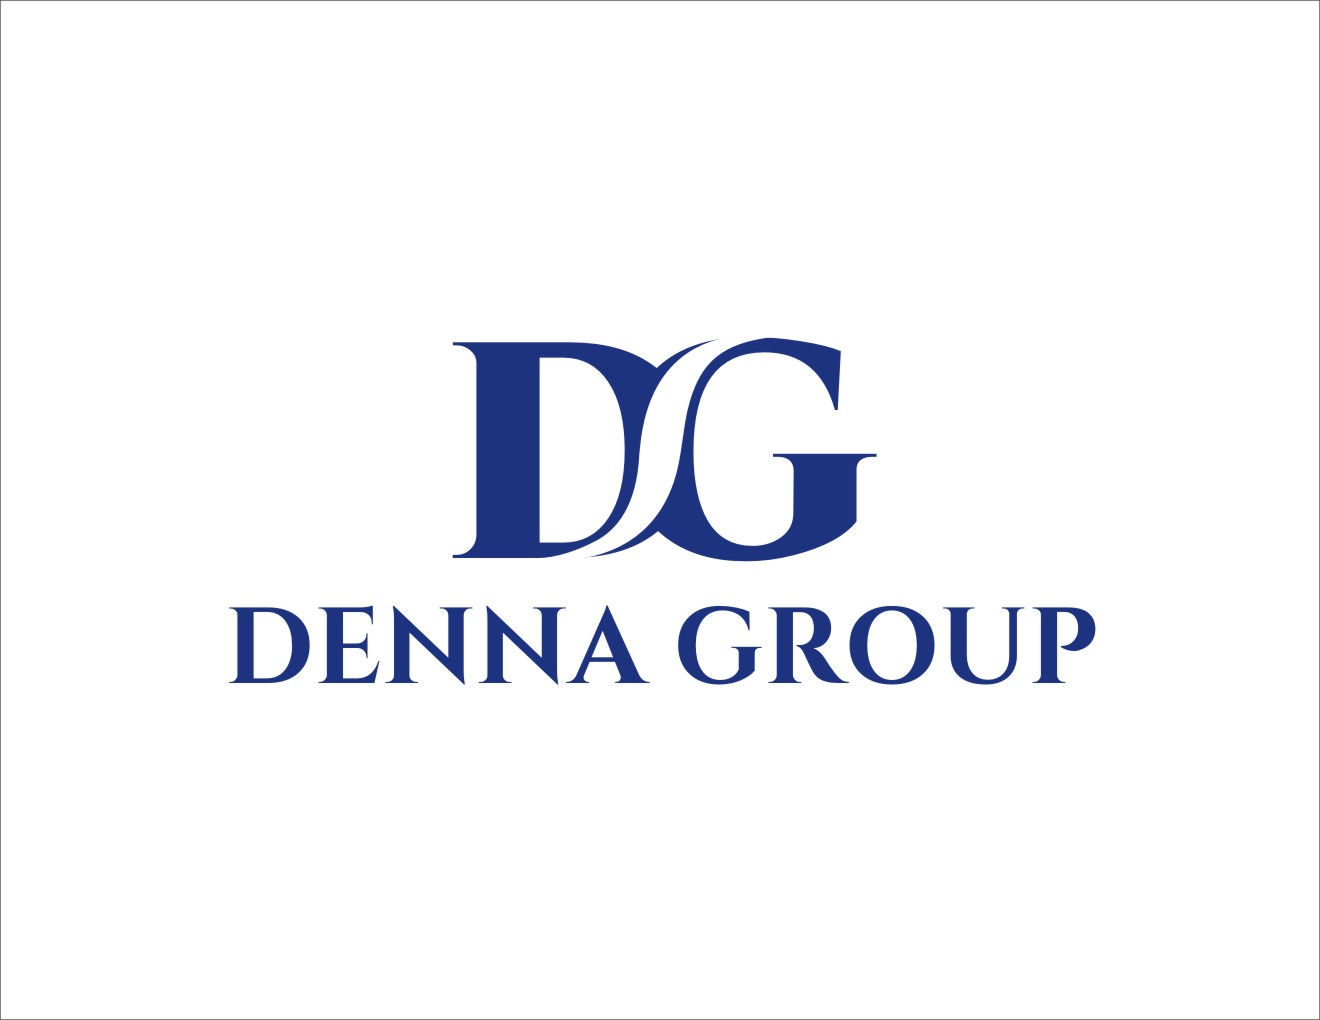 Logo Design by Private User - Entry No. 161 in the Logo Design Contest Denna Group Logo Design.